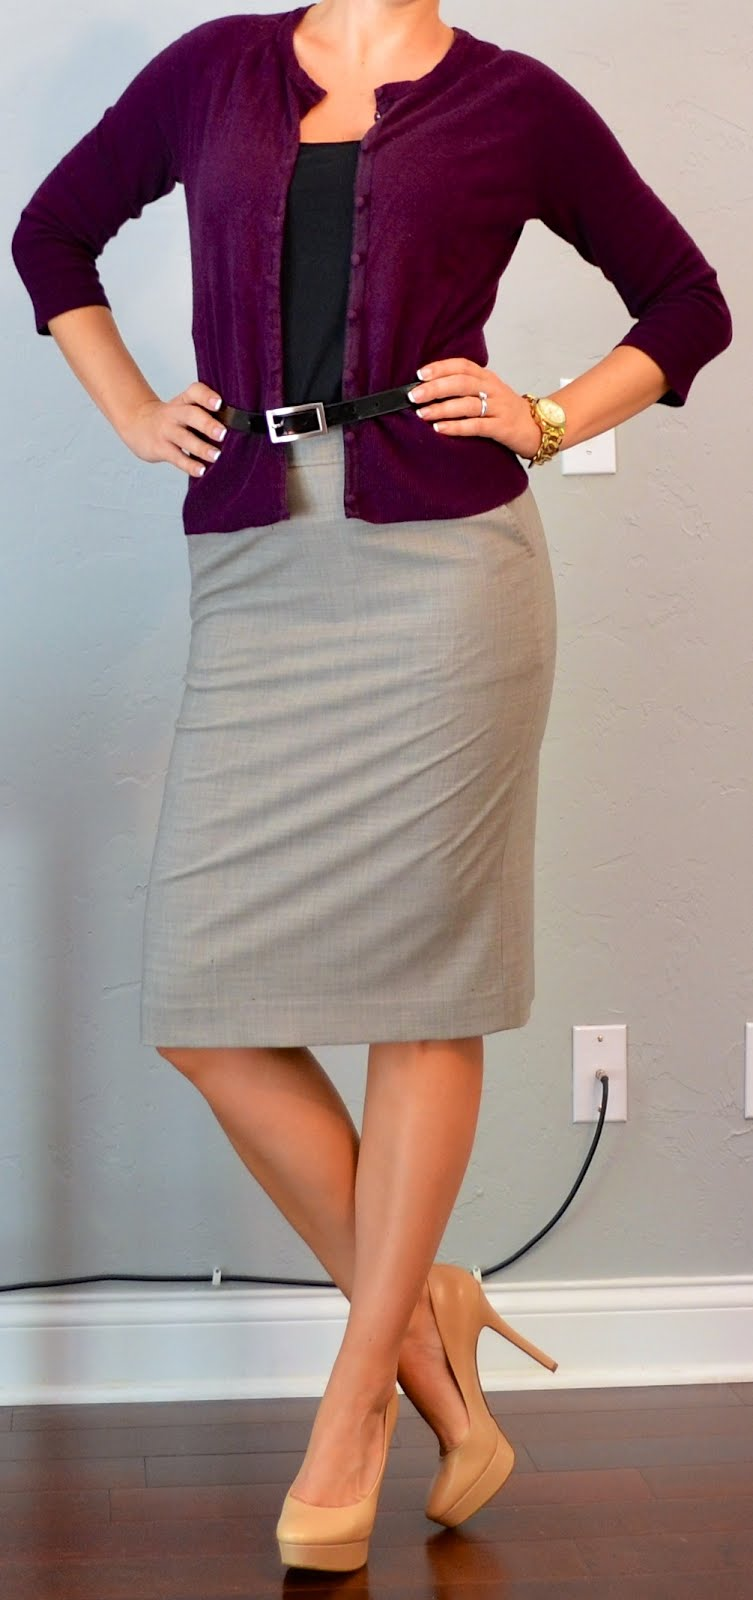 Outfit Post Grey Pencil Skirt Plum Cardigan Nude Pumps